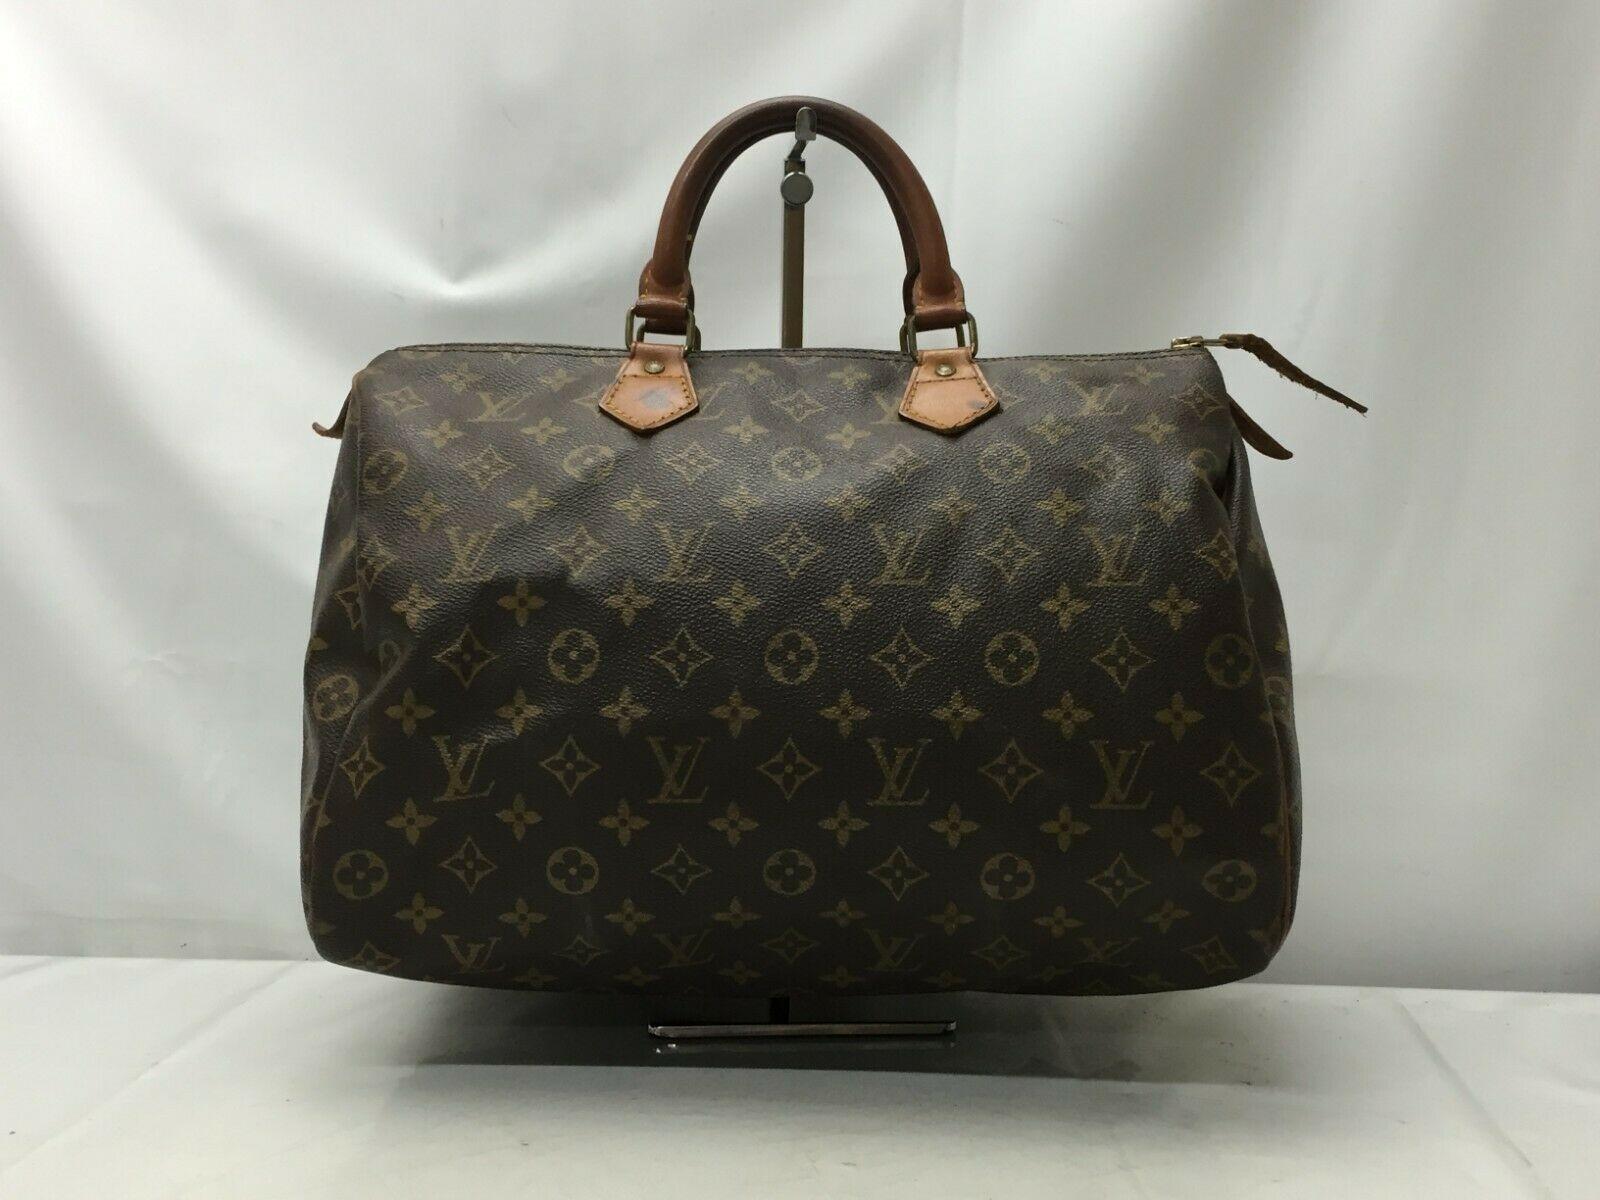 Photo1: Auth Louis Vuitton Monogram Speedy 35 Hand Bag Vintage 9F050340m (1)